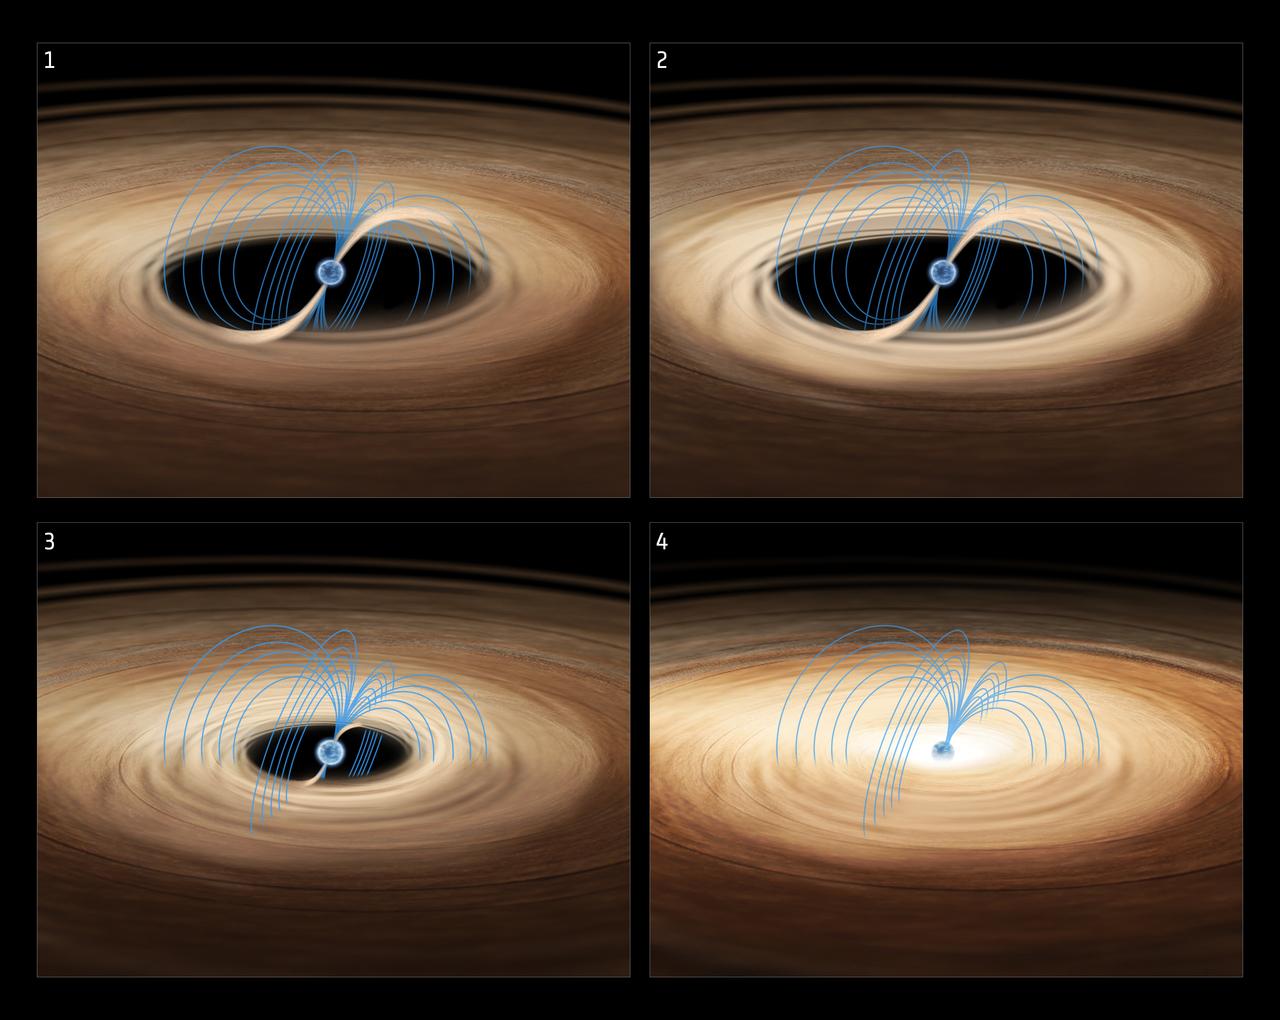 1567214651511-ESA_Rapid_Burster_neutron_star_1280.jpg